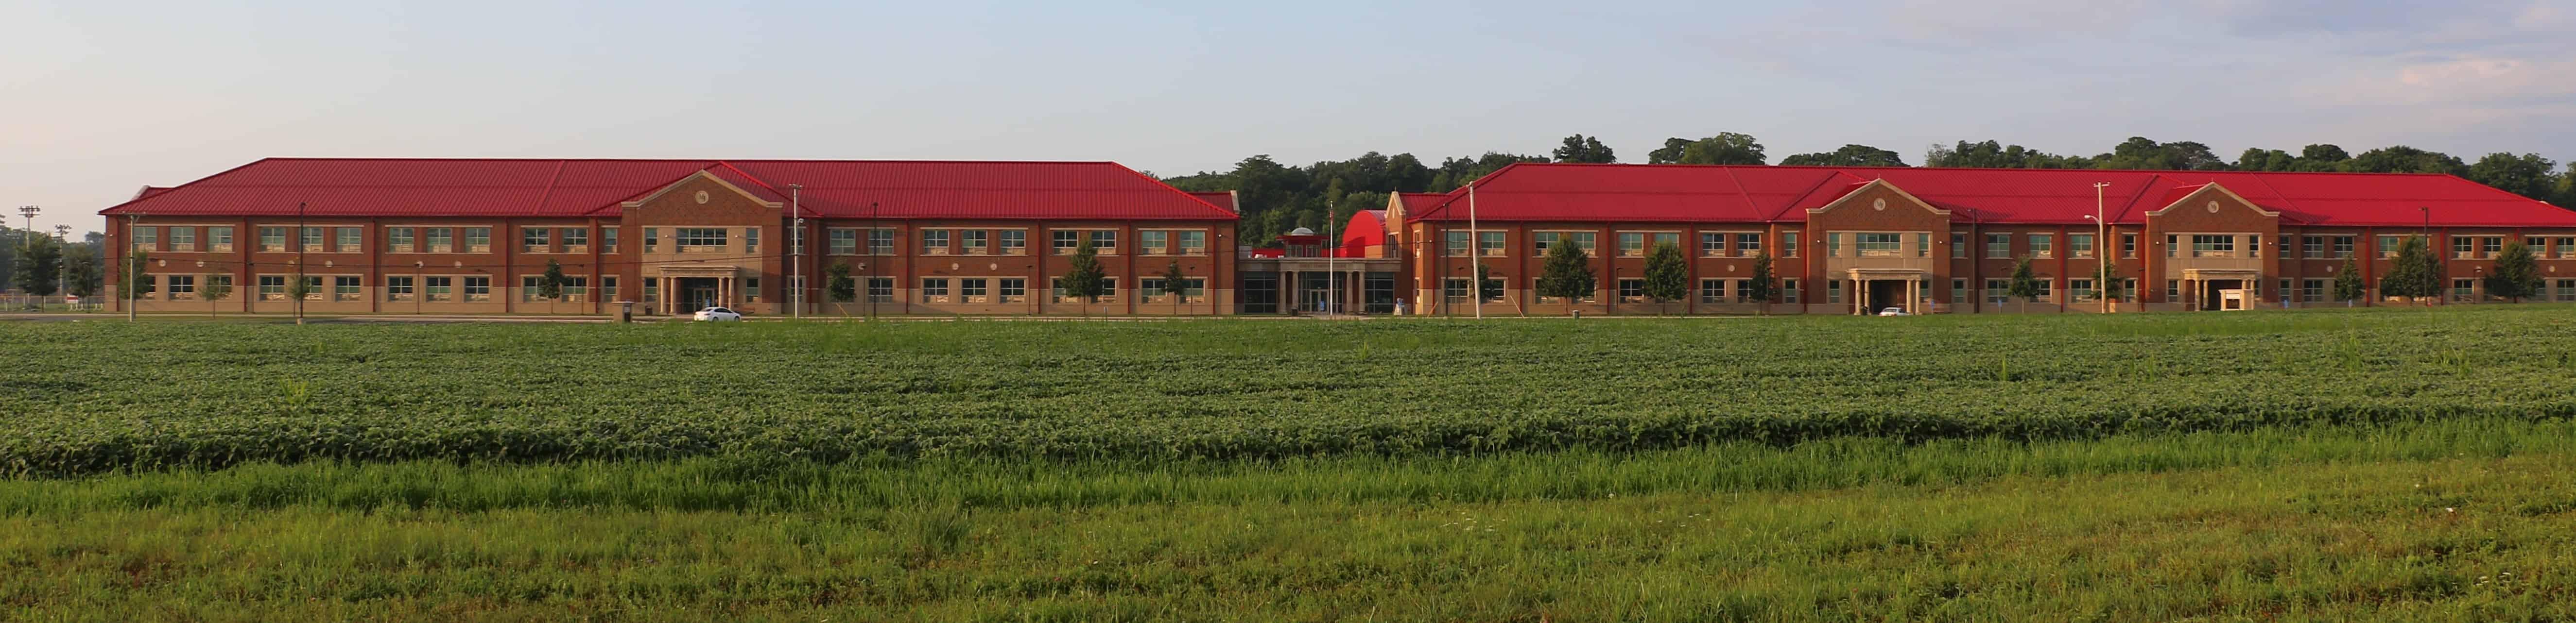 Milton-Union Schools - West Milton Ohio